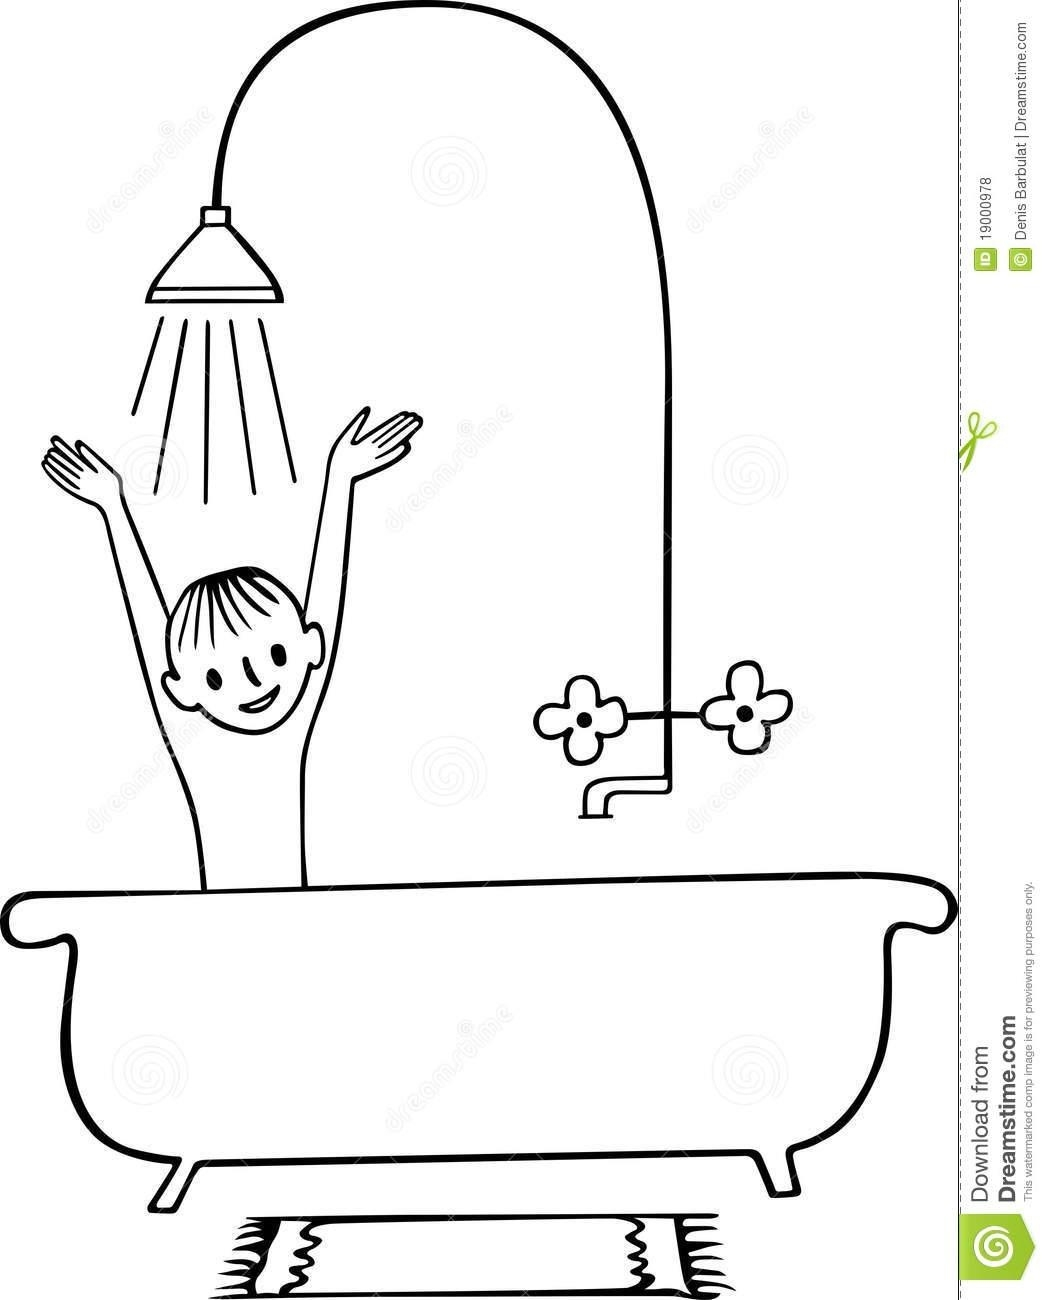 Shower clipart black and white clip art transparent library Shower Clipart Black And White – Free Clip Art Images ... clip art transparent library